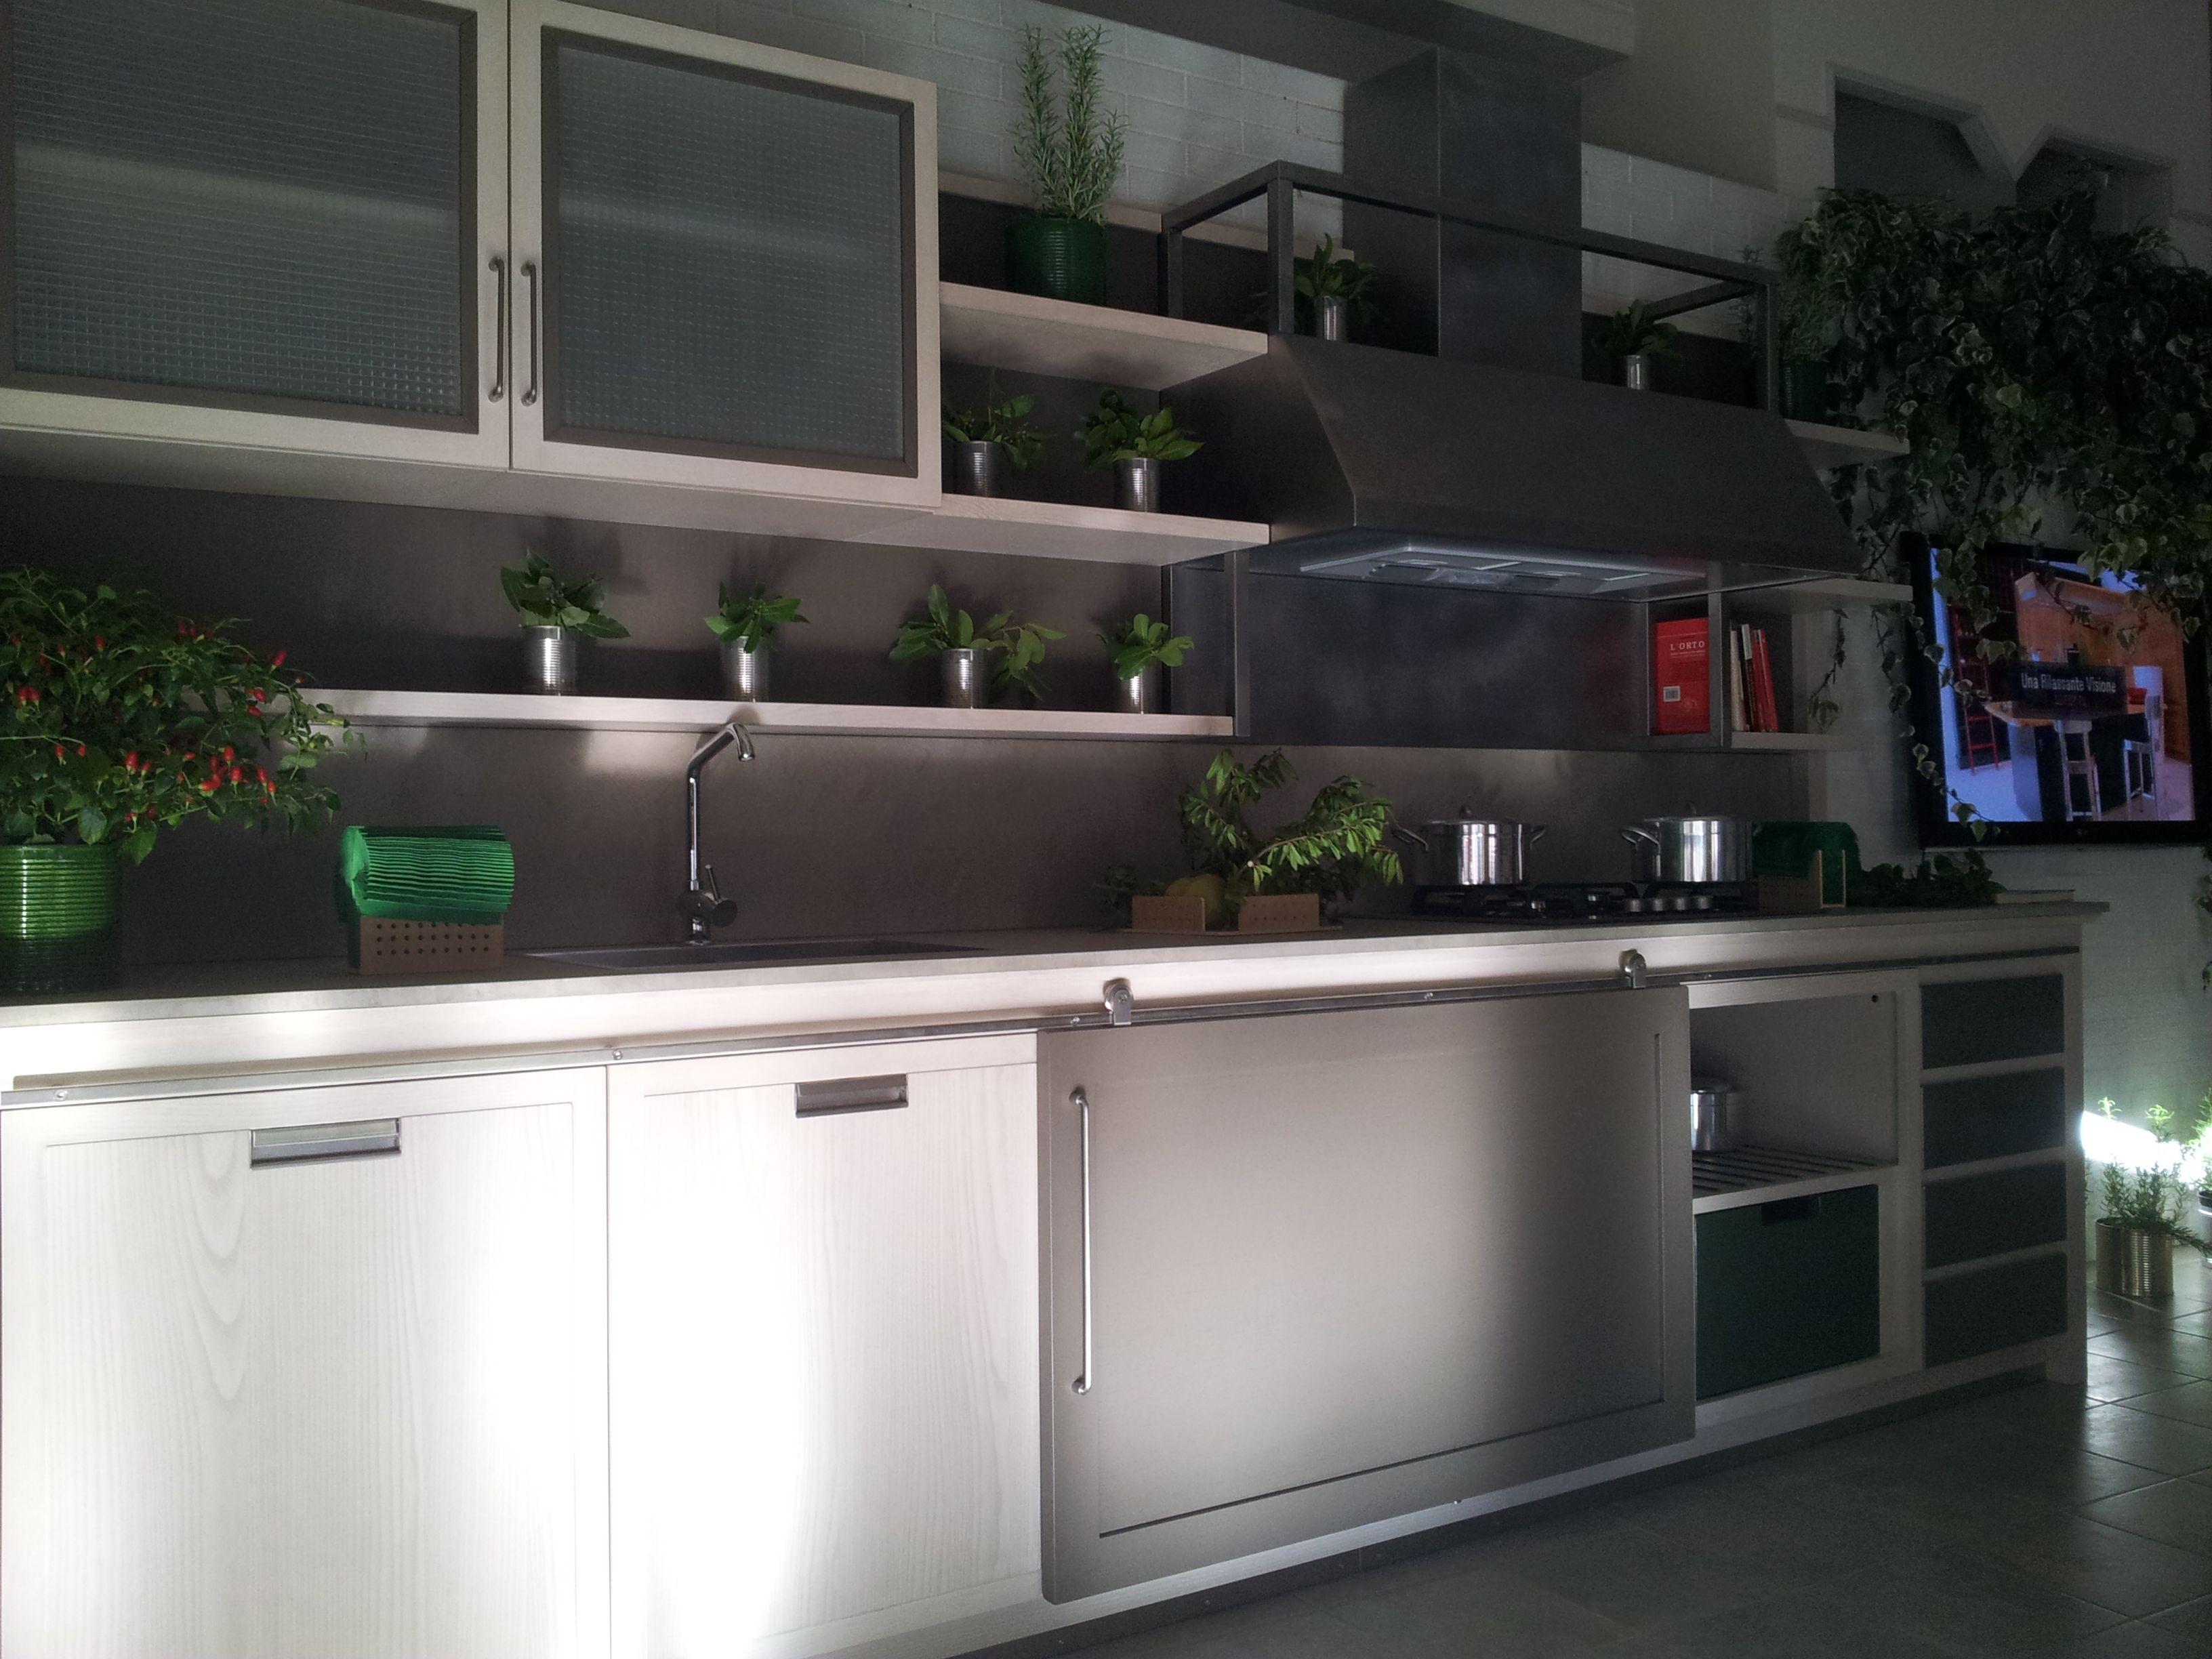 Cucina Industrial Chic Style | Cucine INDUSTRIAL CHIC | Pinterest ...